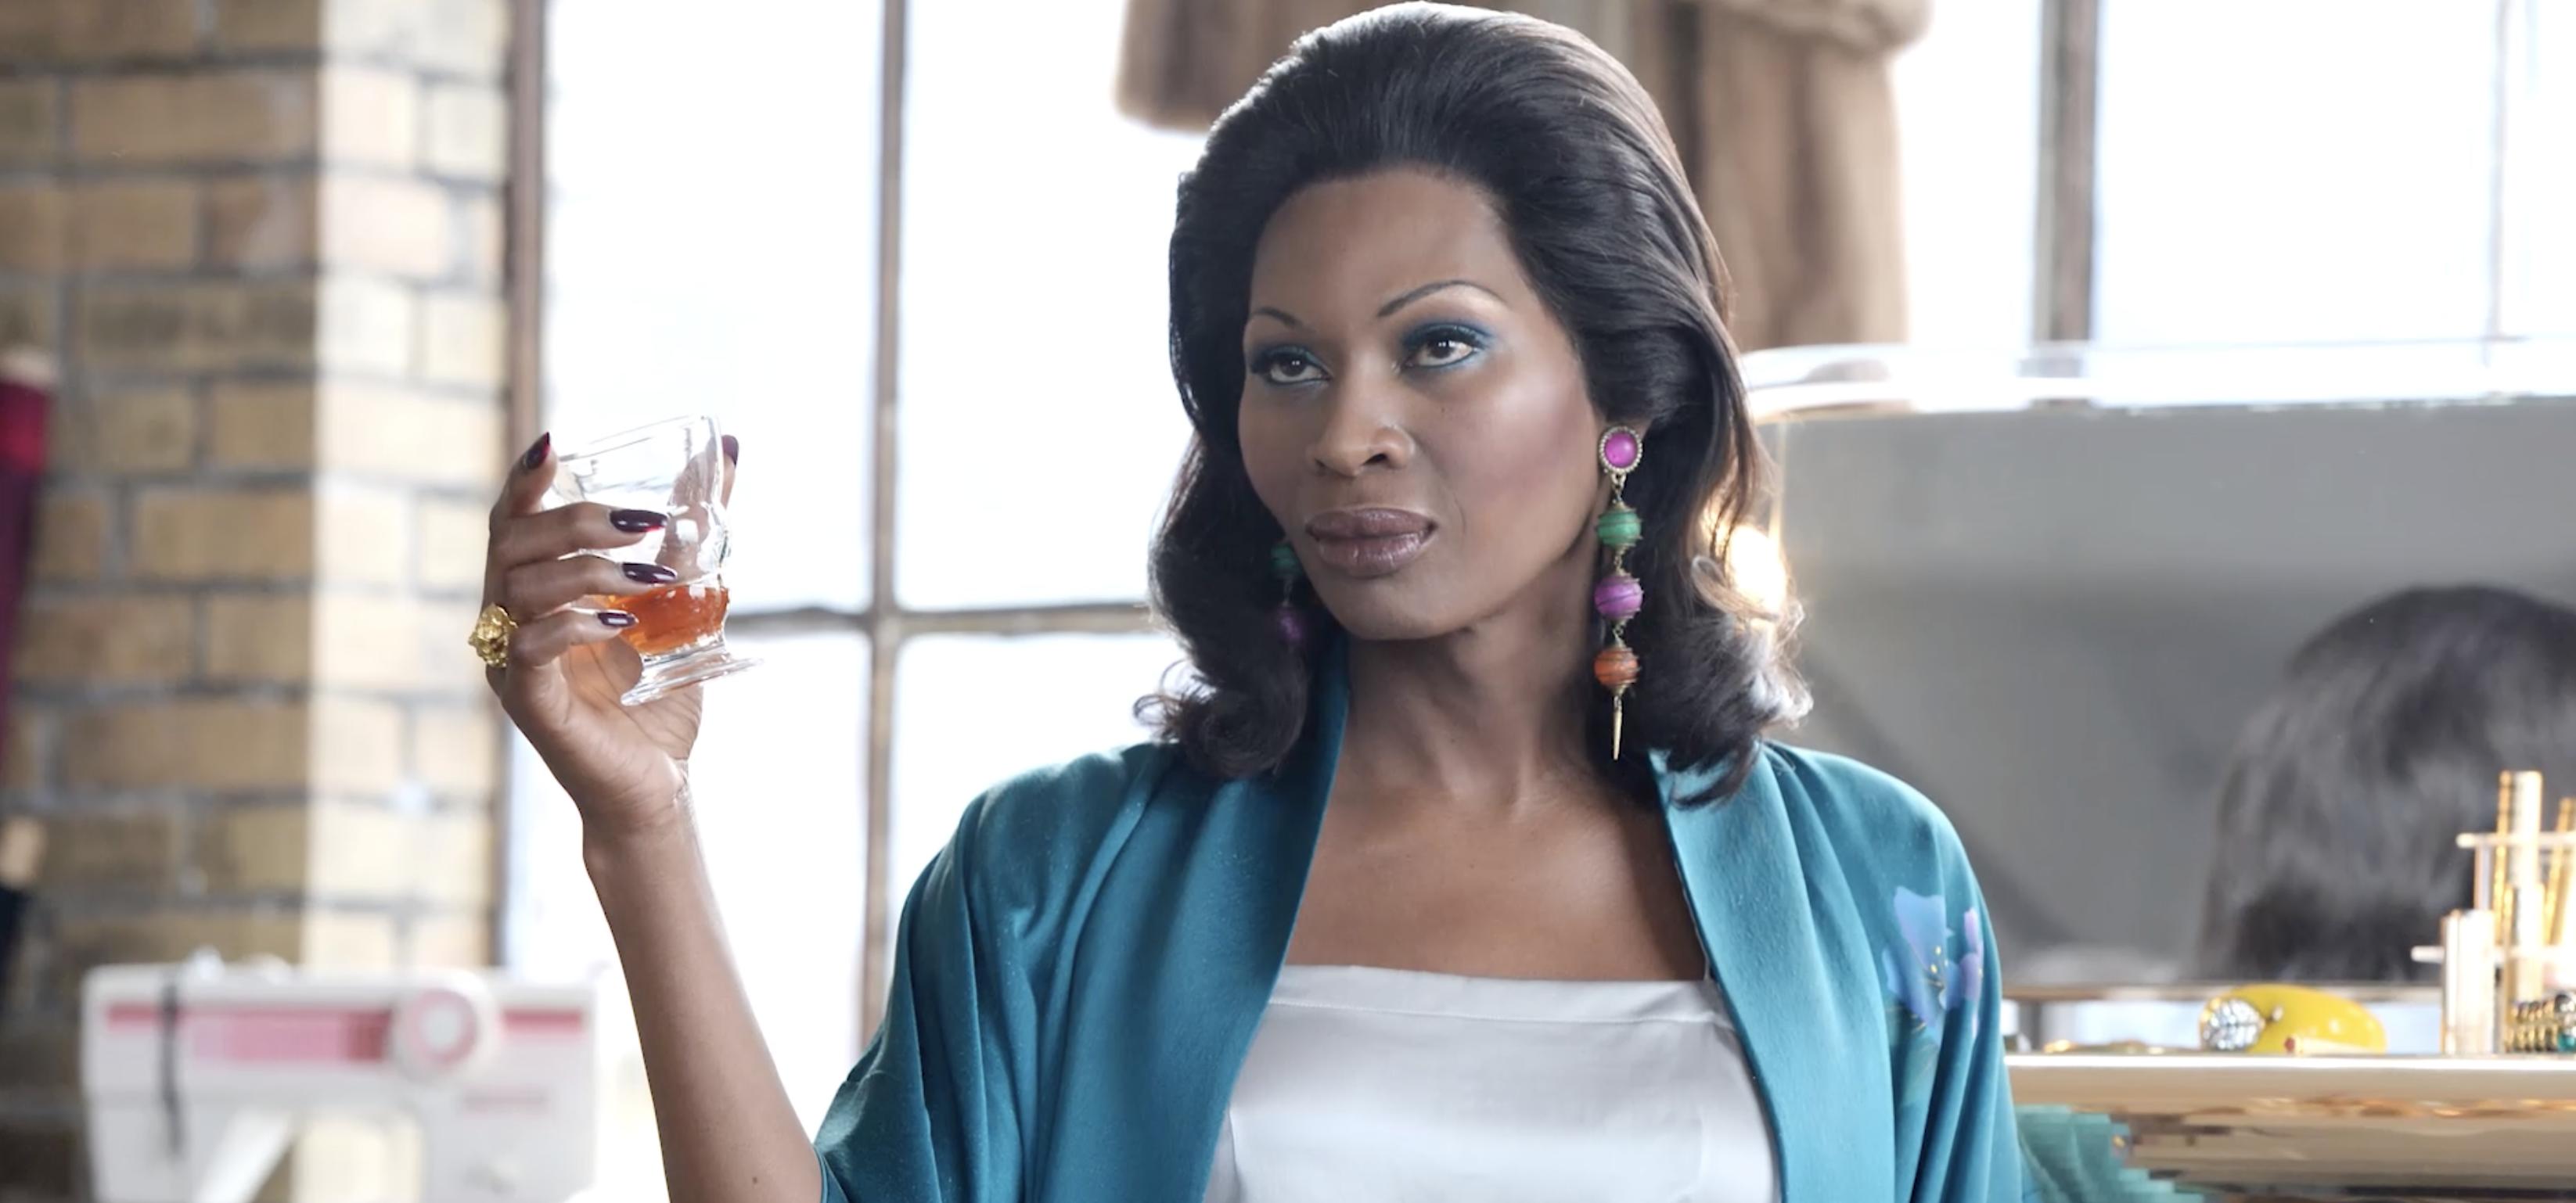 Desmontamos 8 mitos transfóbicos que deben desaparecer para siempre